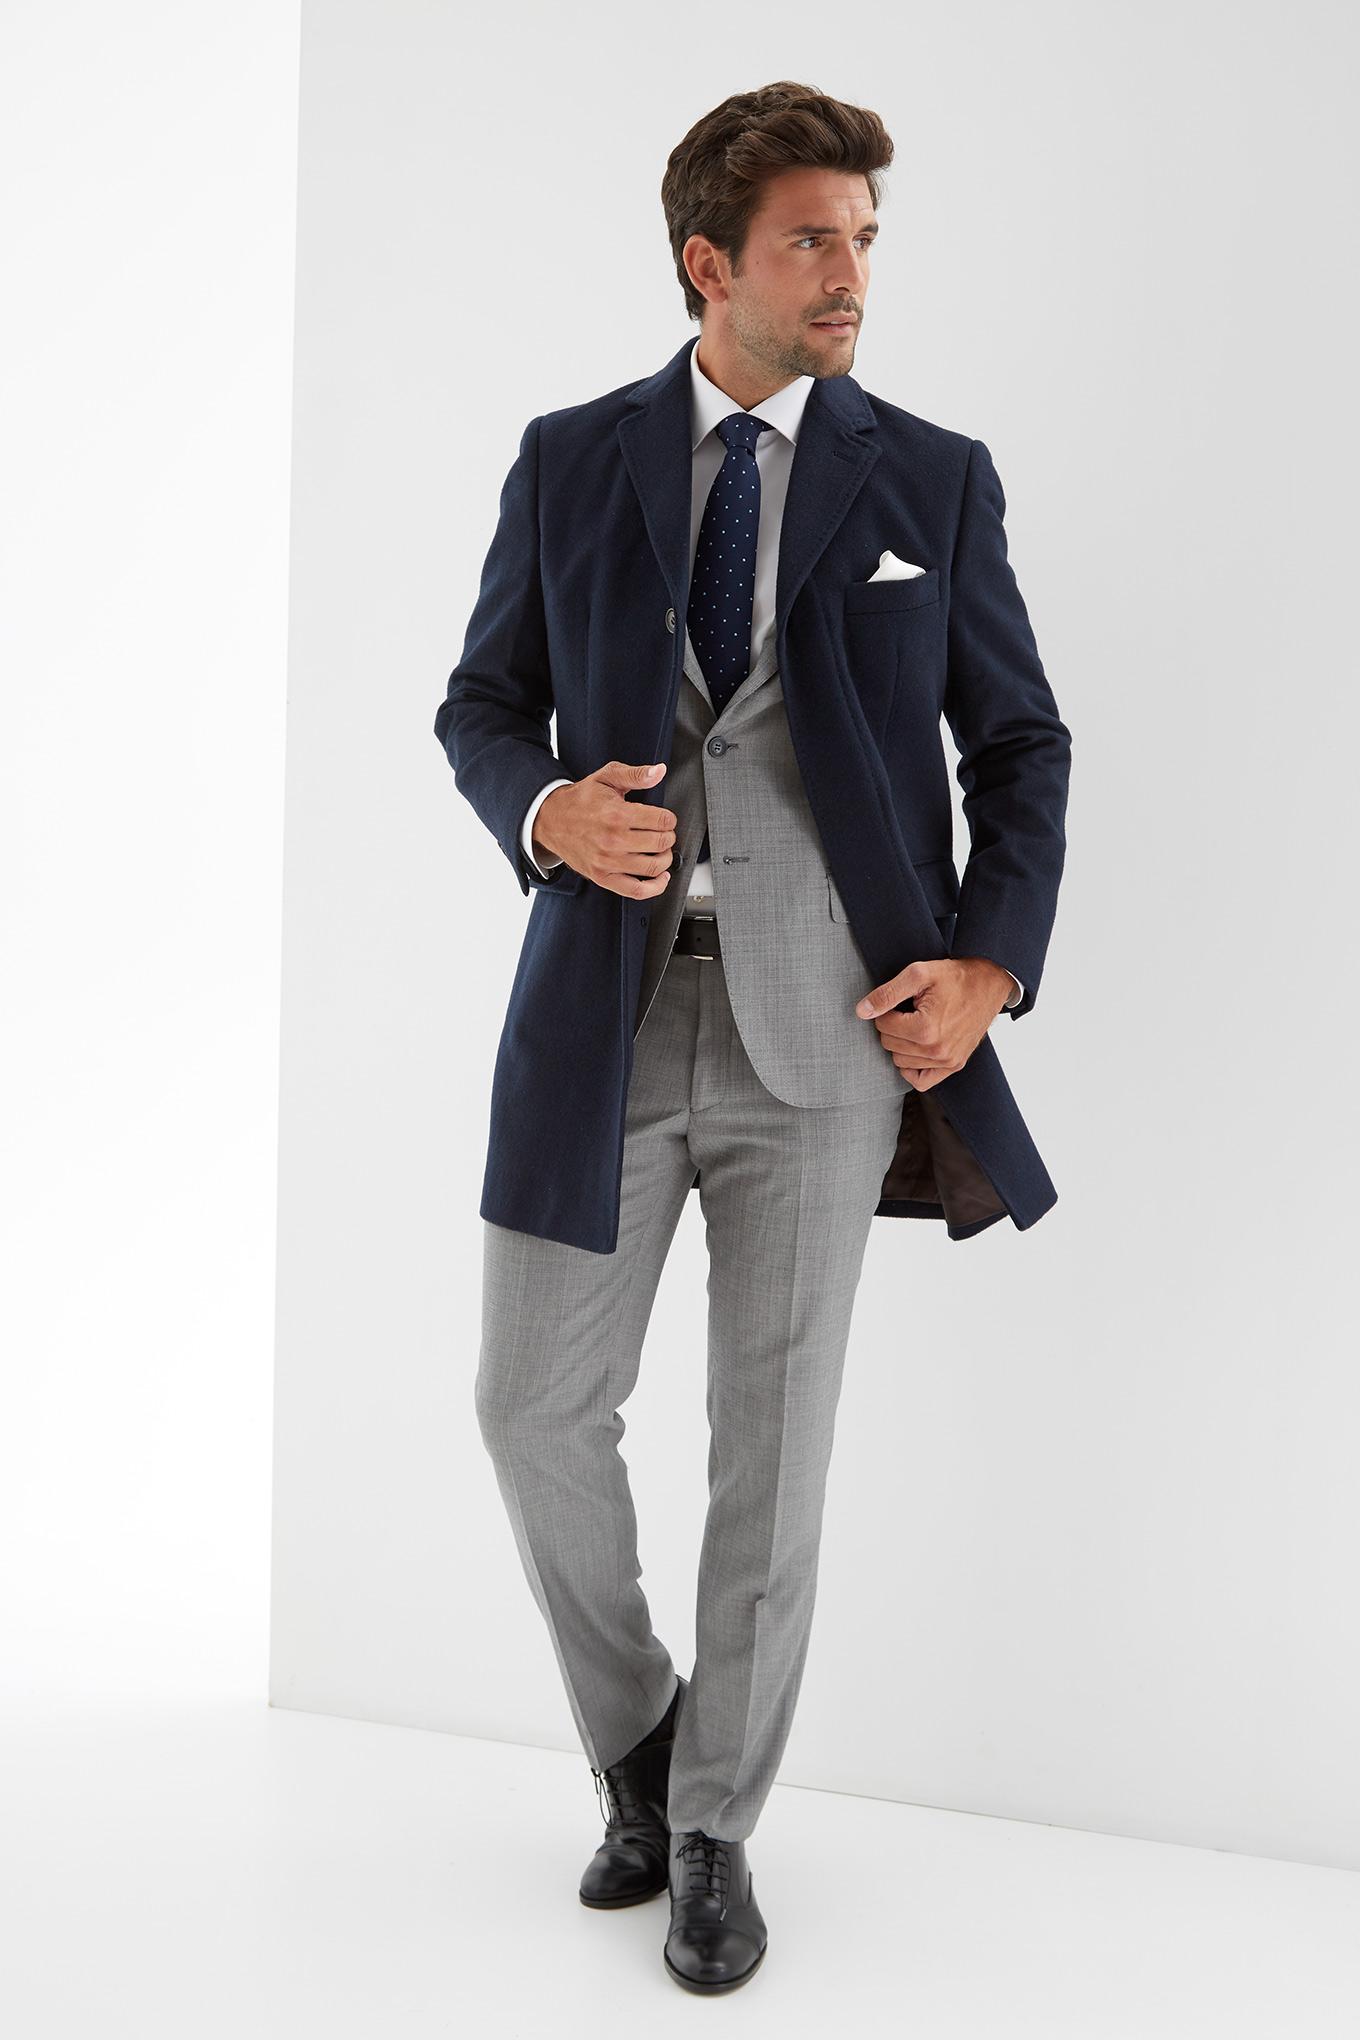 Overcoat Dark Blue Casual Man